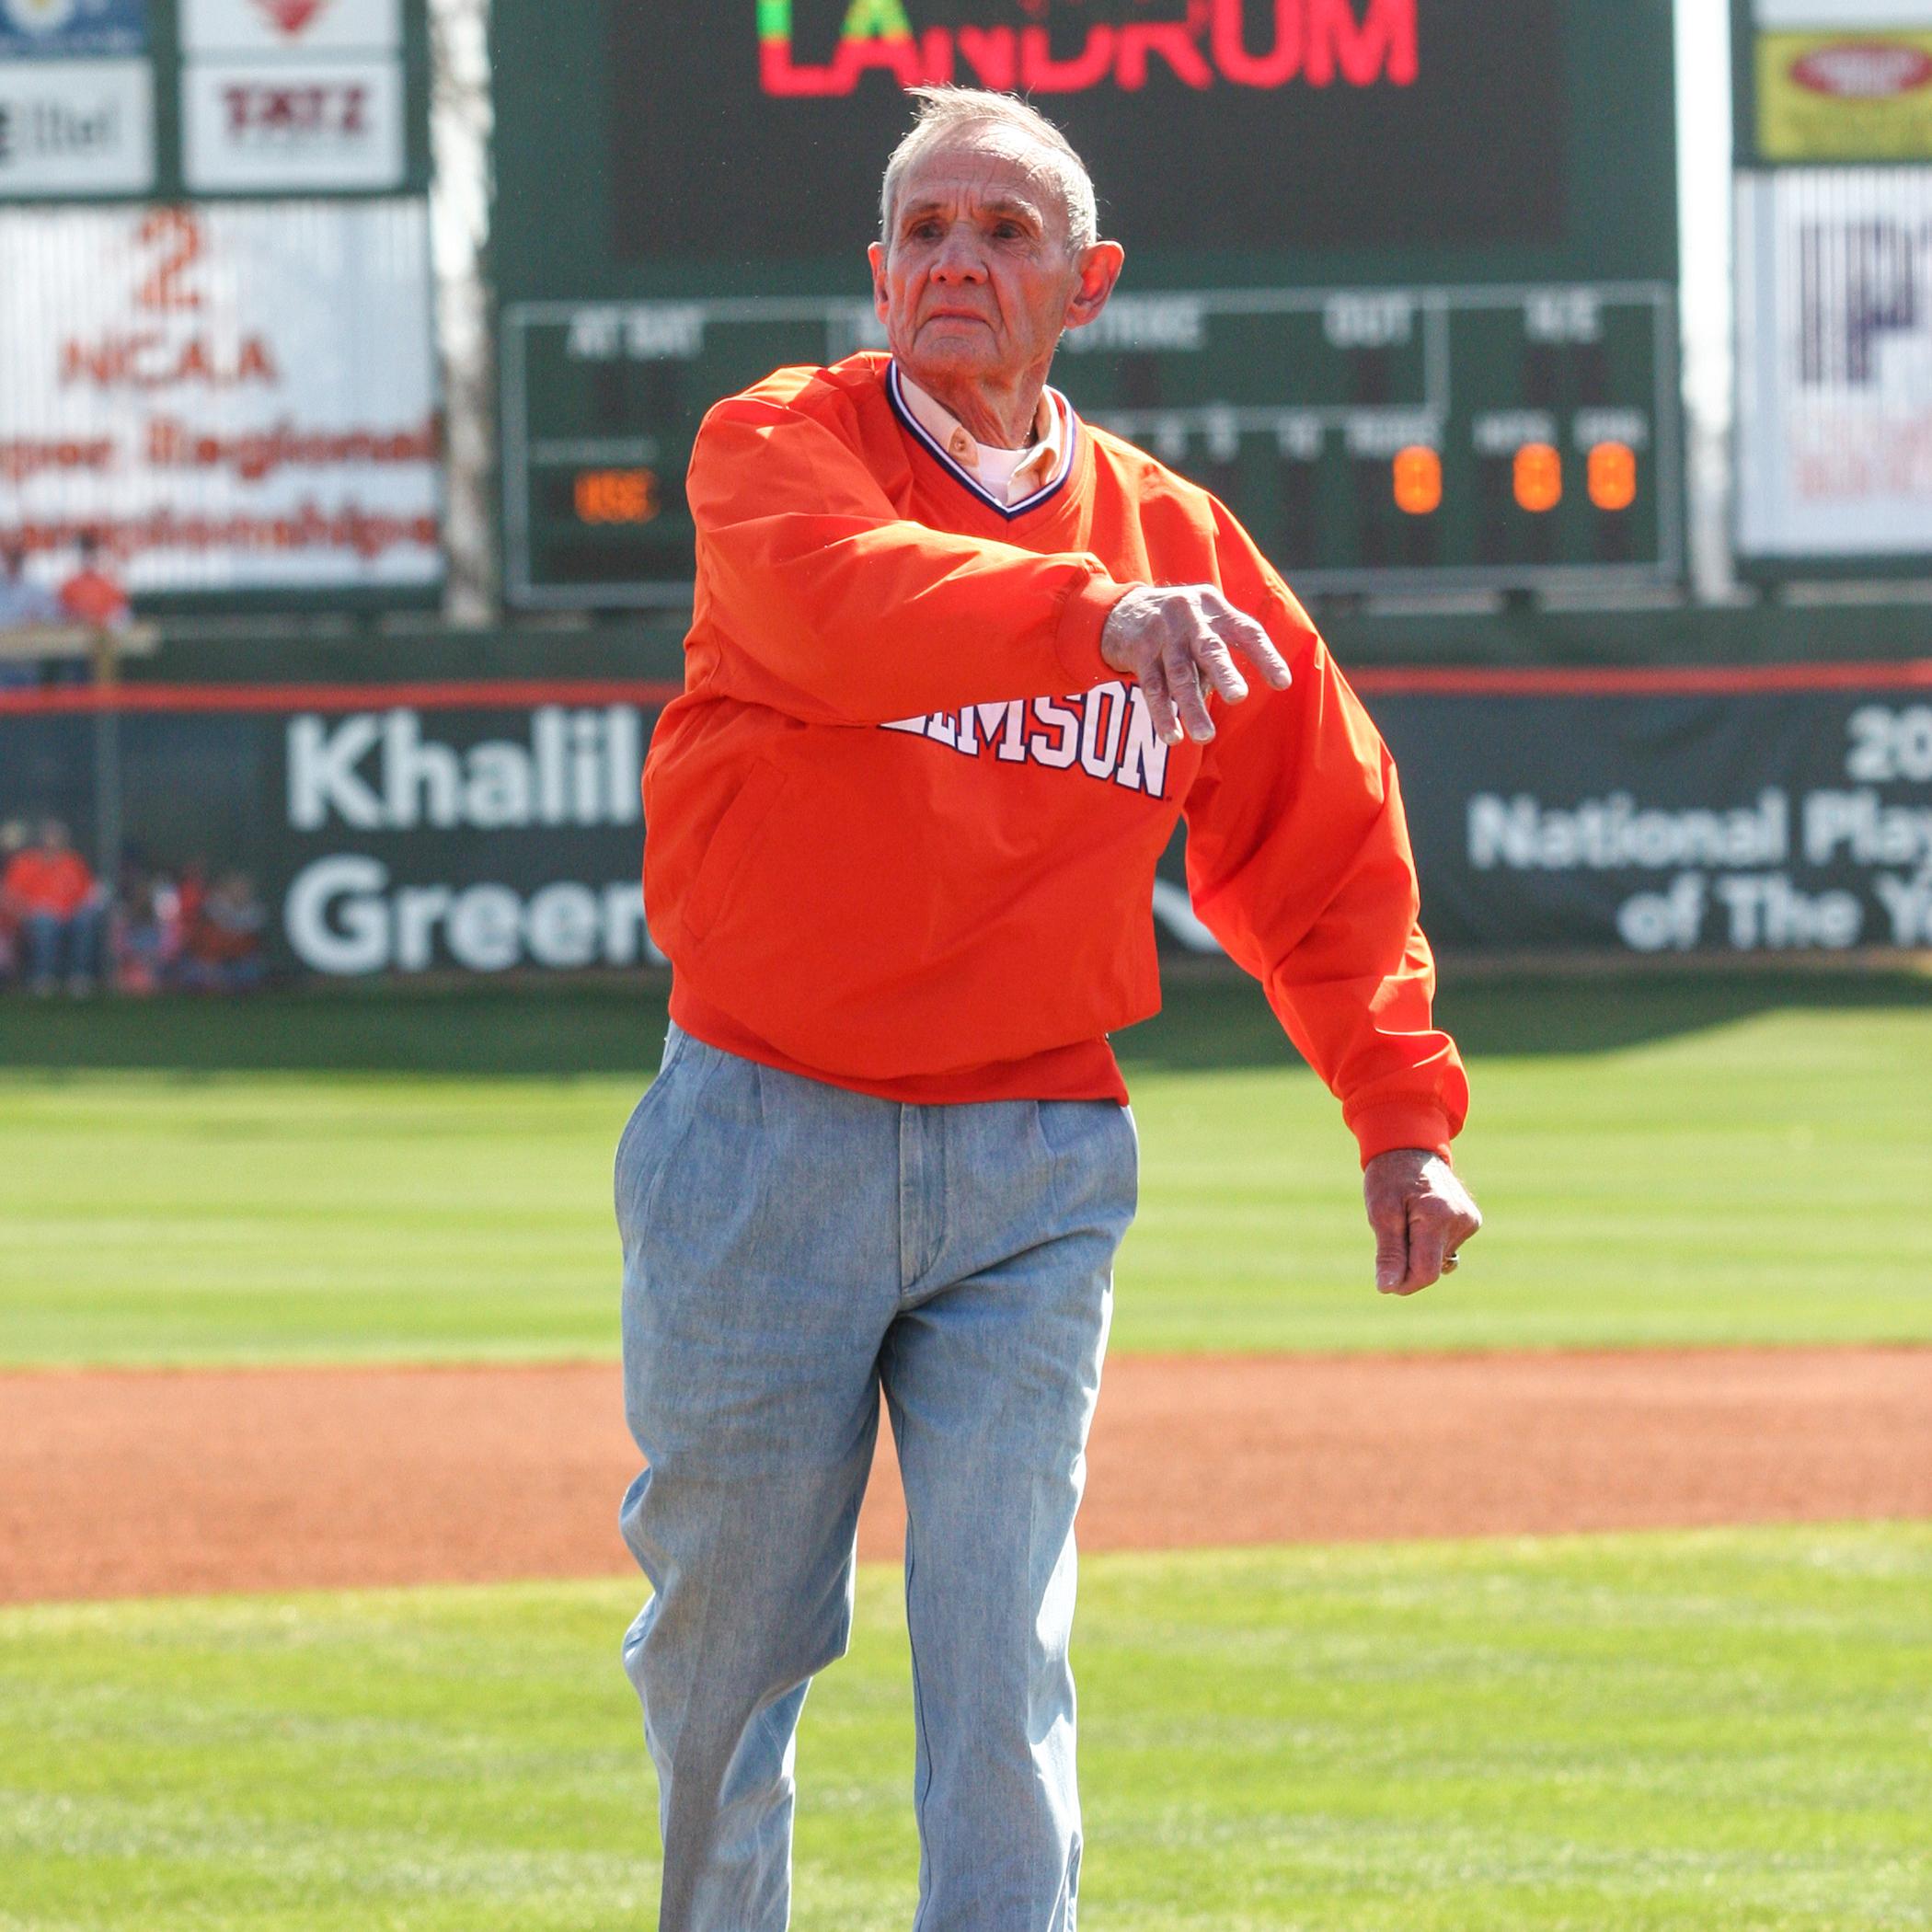 Joe Landrum, Clemson's First Baseball All-American, Passes